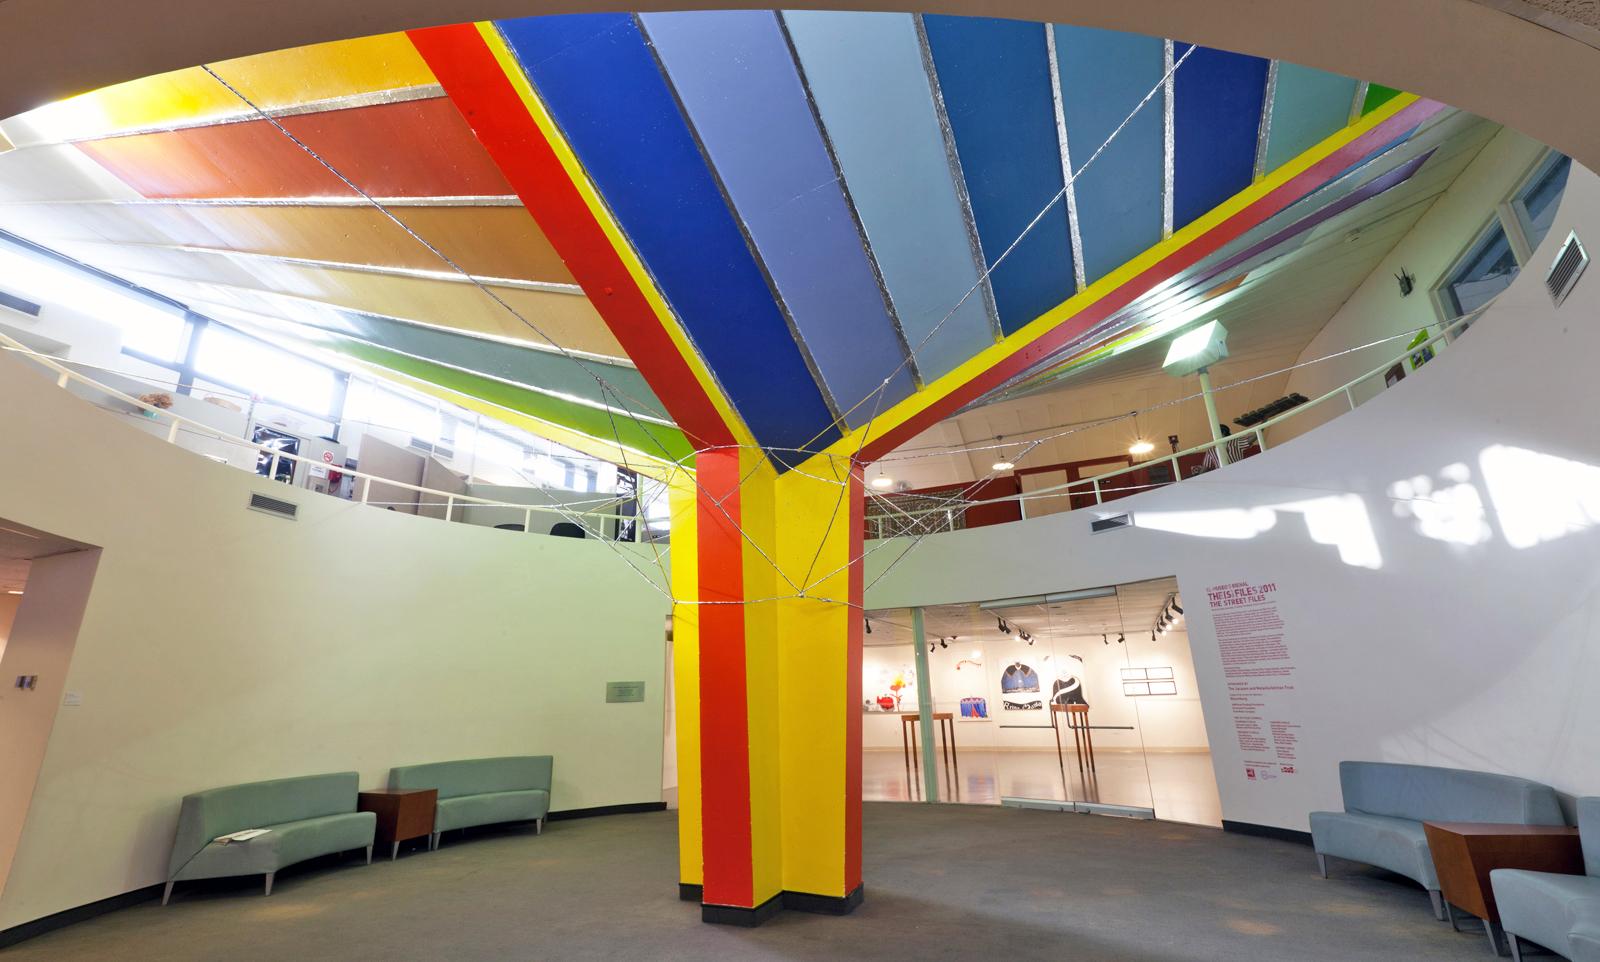 The Inverted Umbrella/Landscape: Breuer's Sunshine, Goose-style, 2011